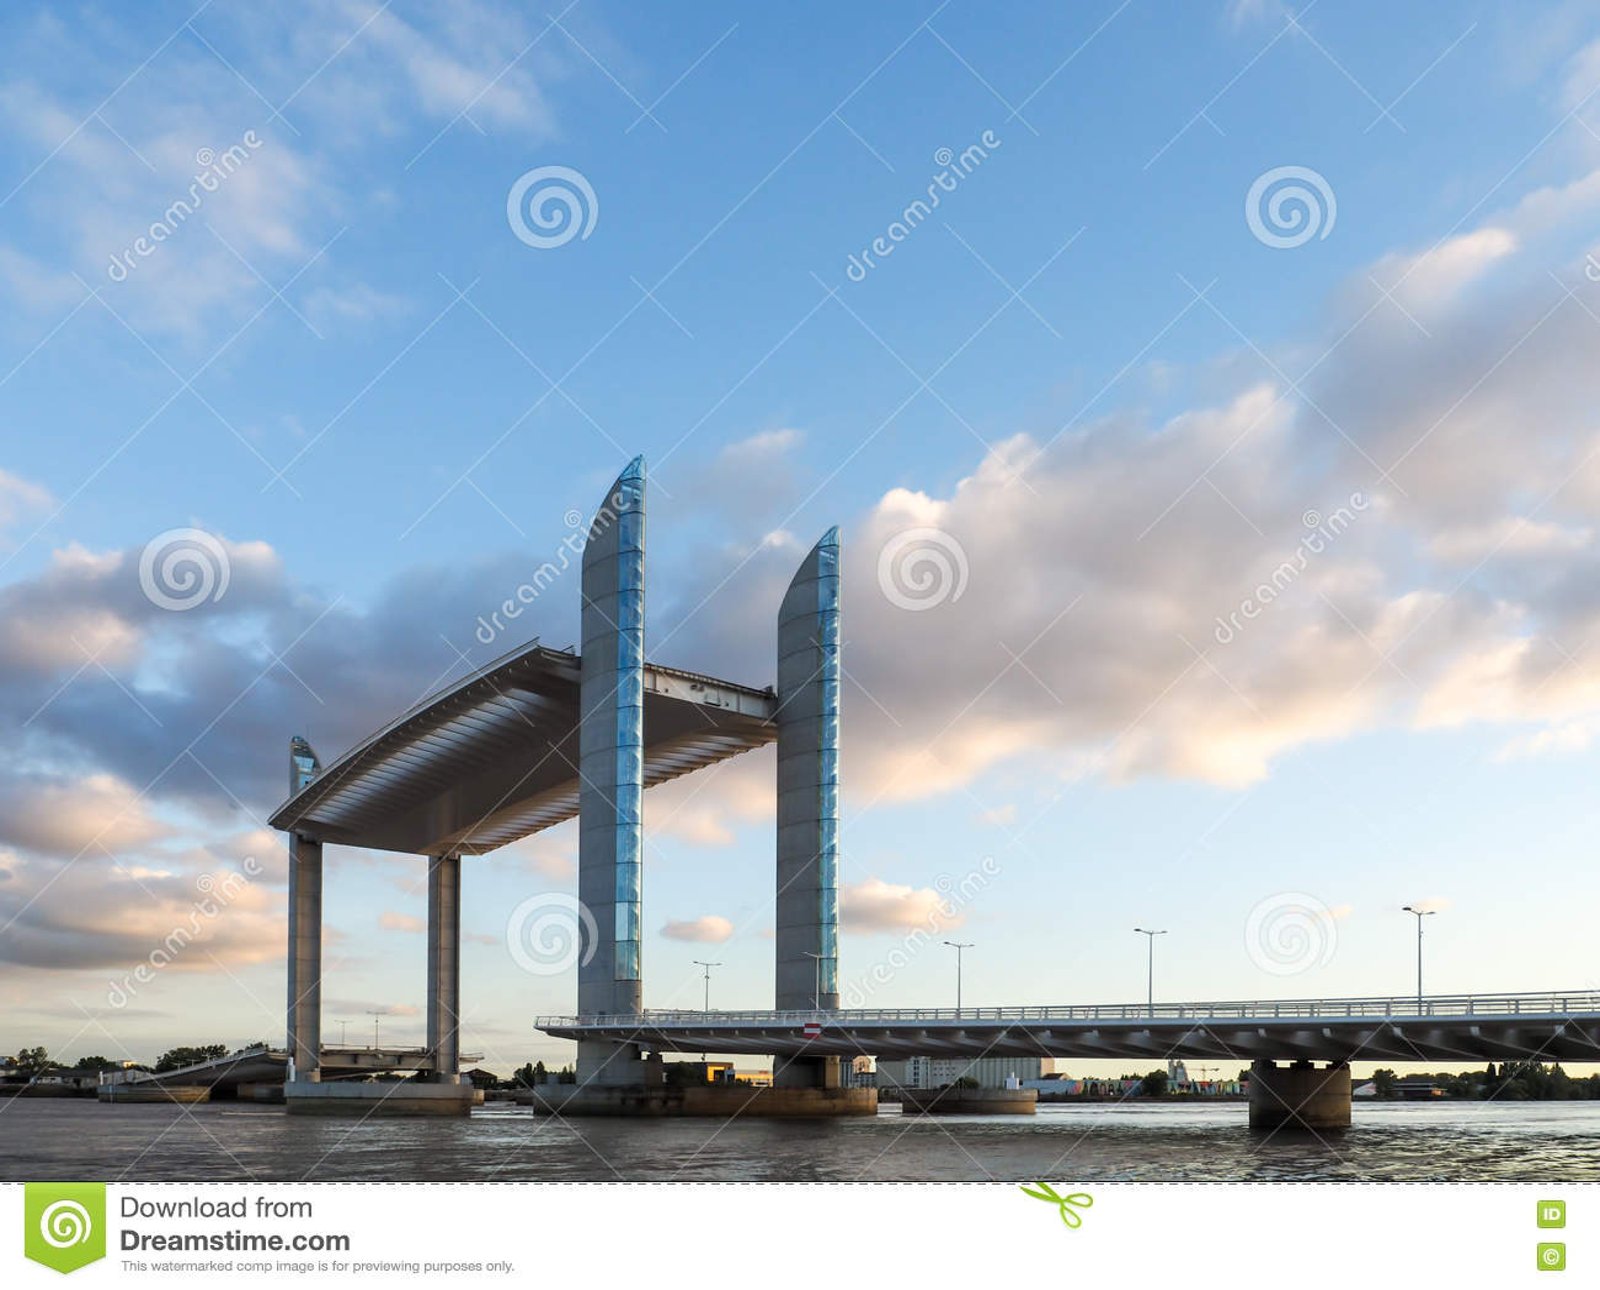 BORDEAUX GIRONDE/FRANCE - SEPTEMBER 18: Ny elevatorbro Jacque